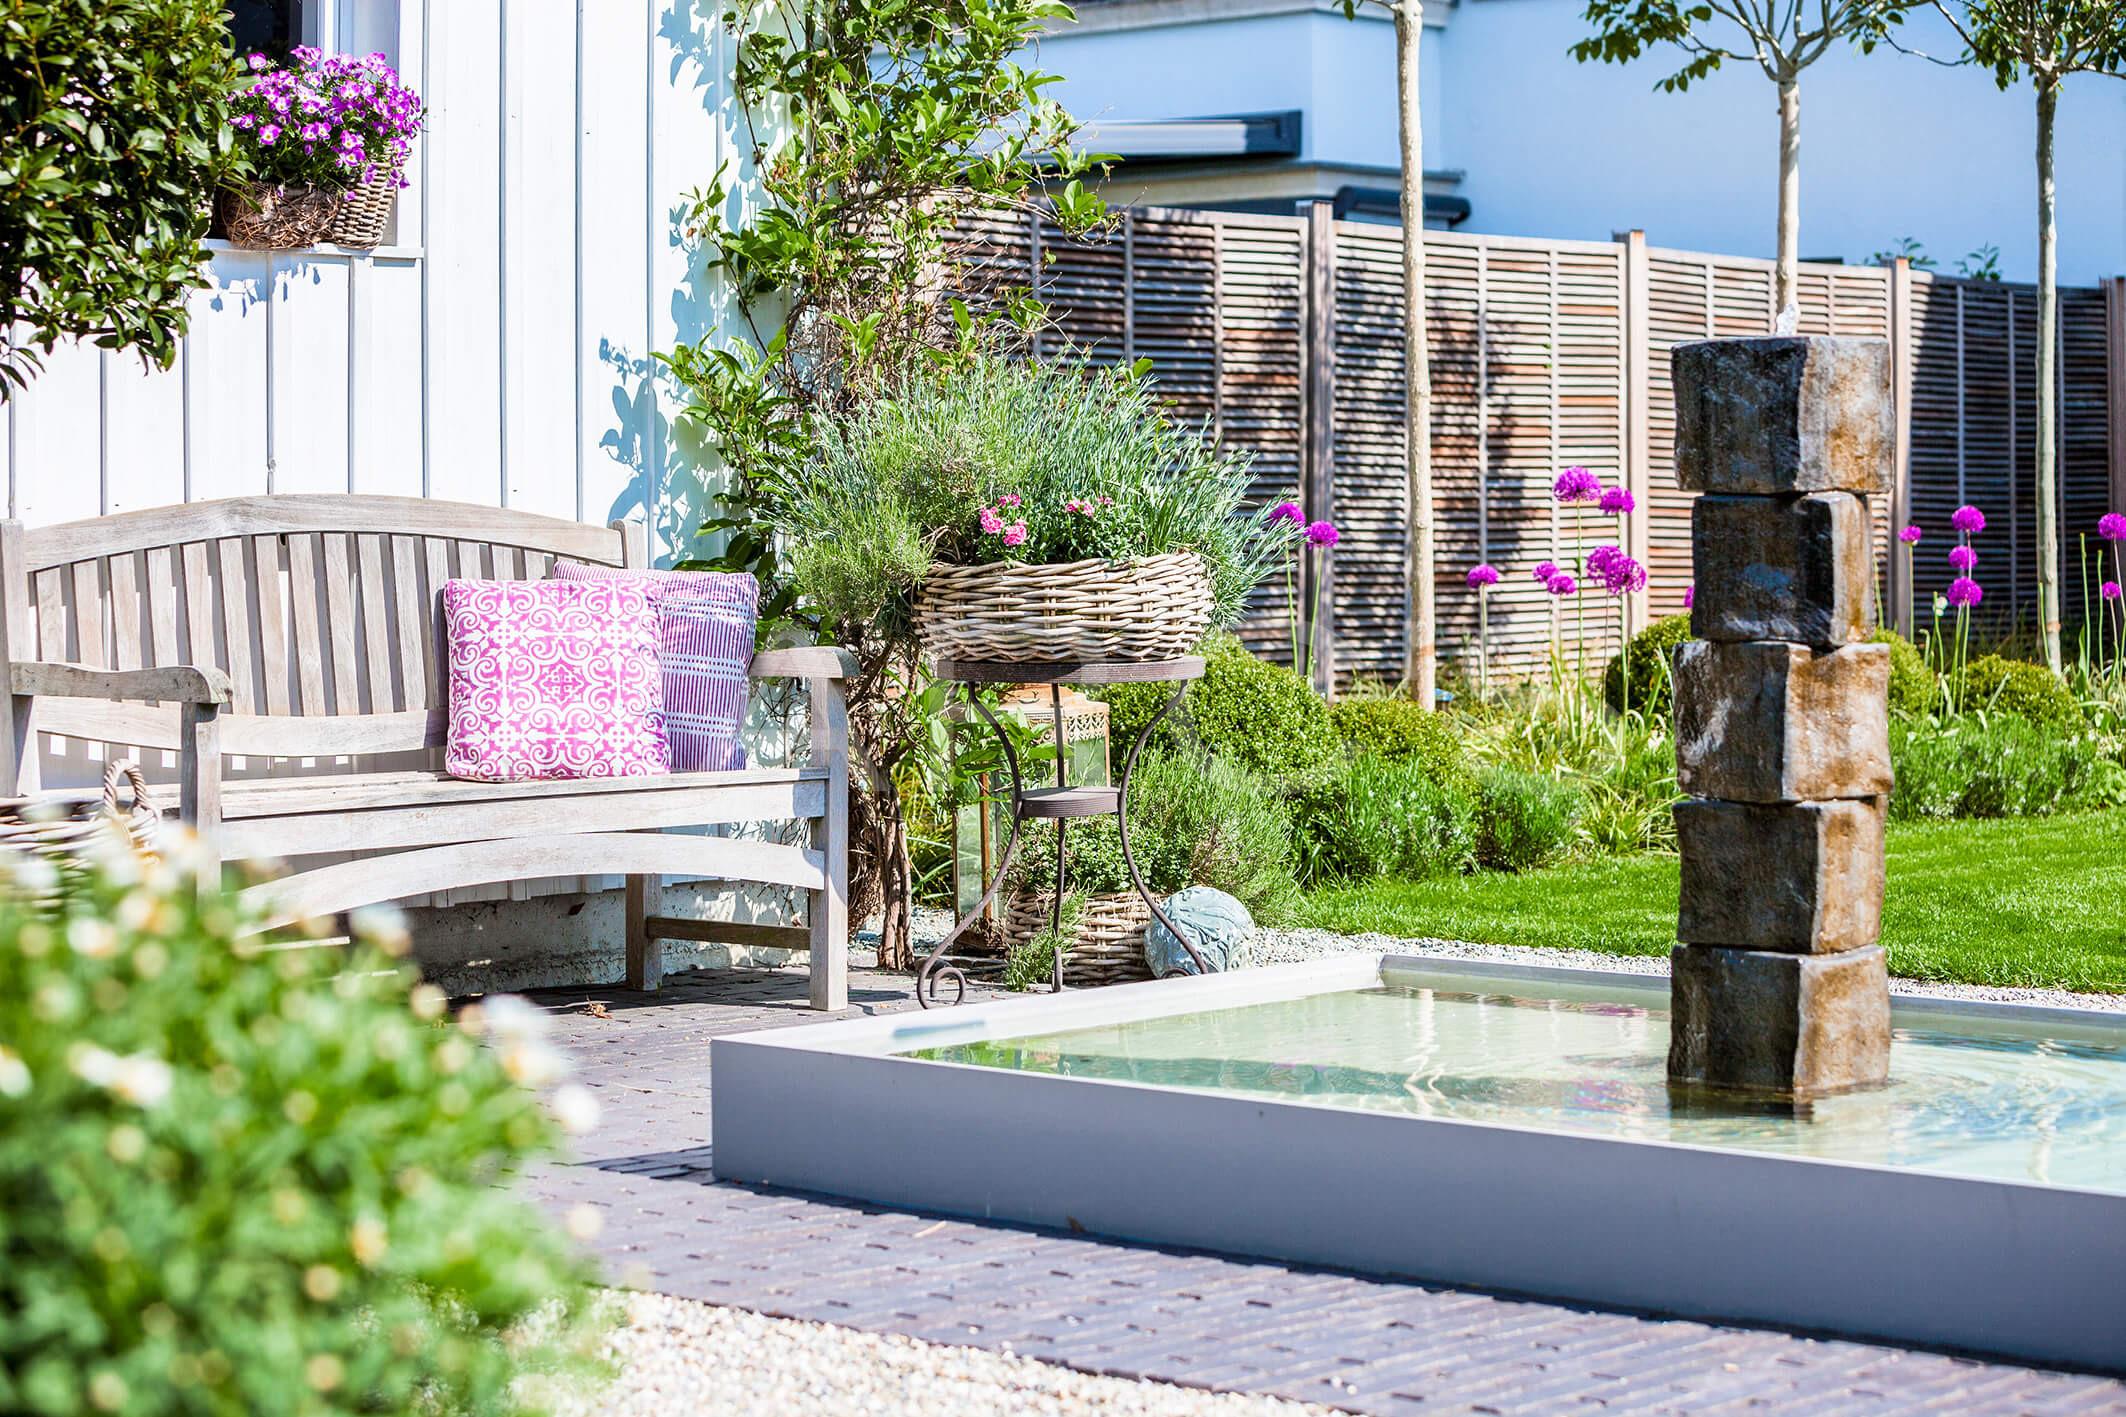 belgisch-englischer gartenstil - parc's gartengestaltung, Garten ideen